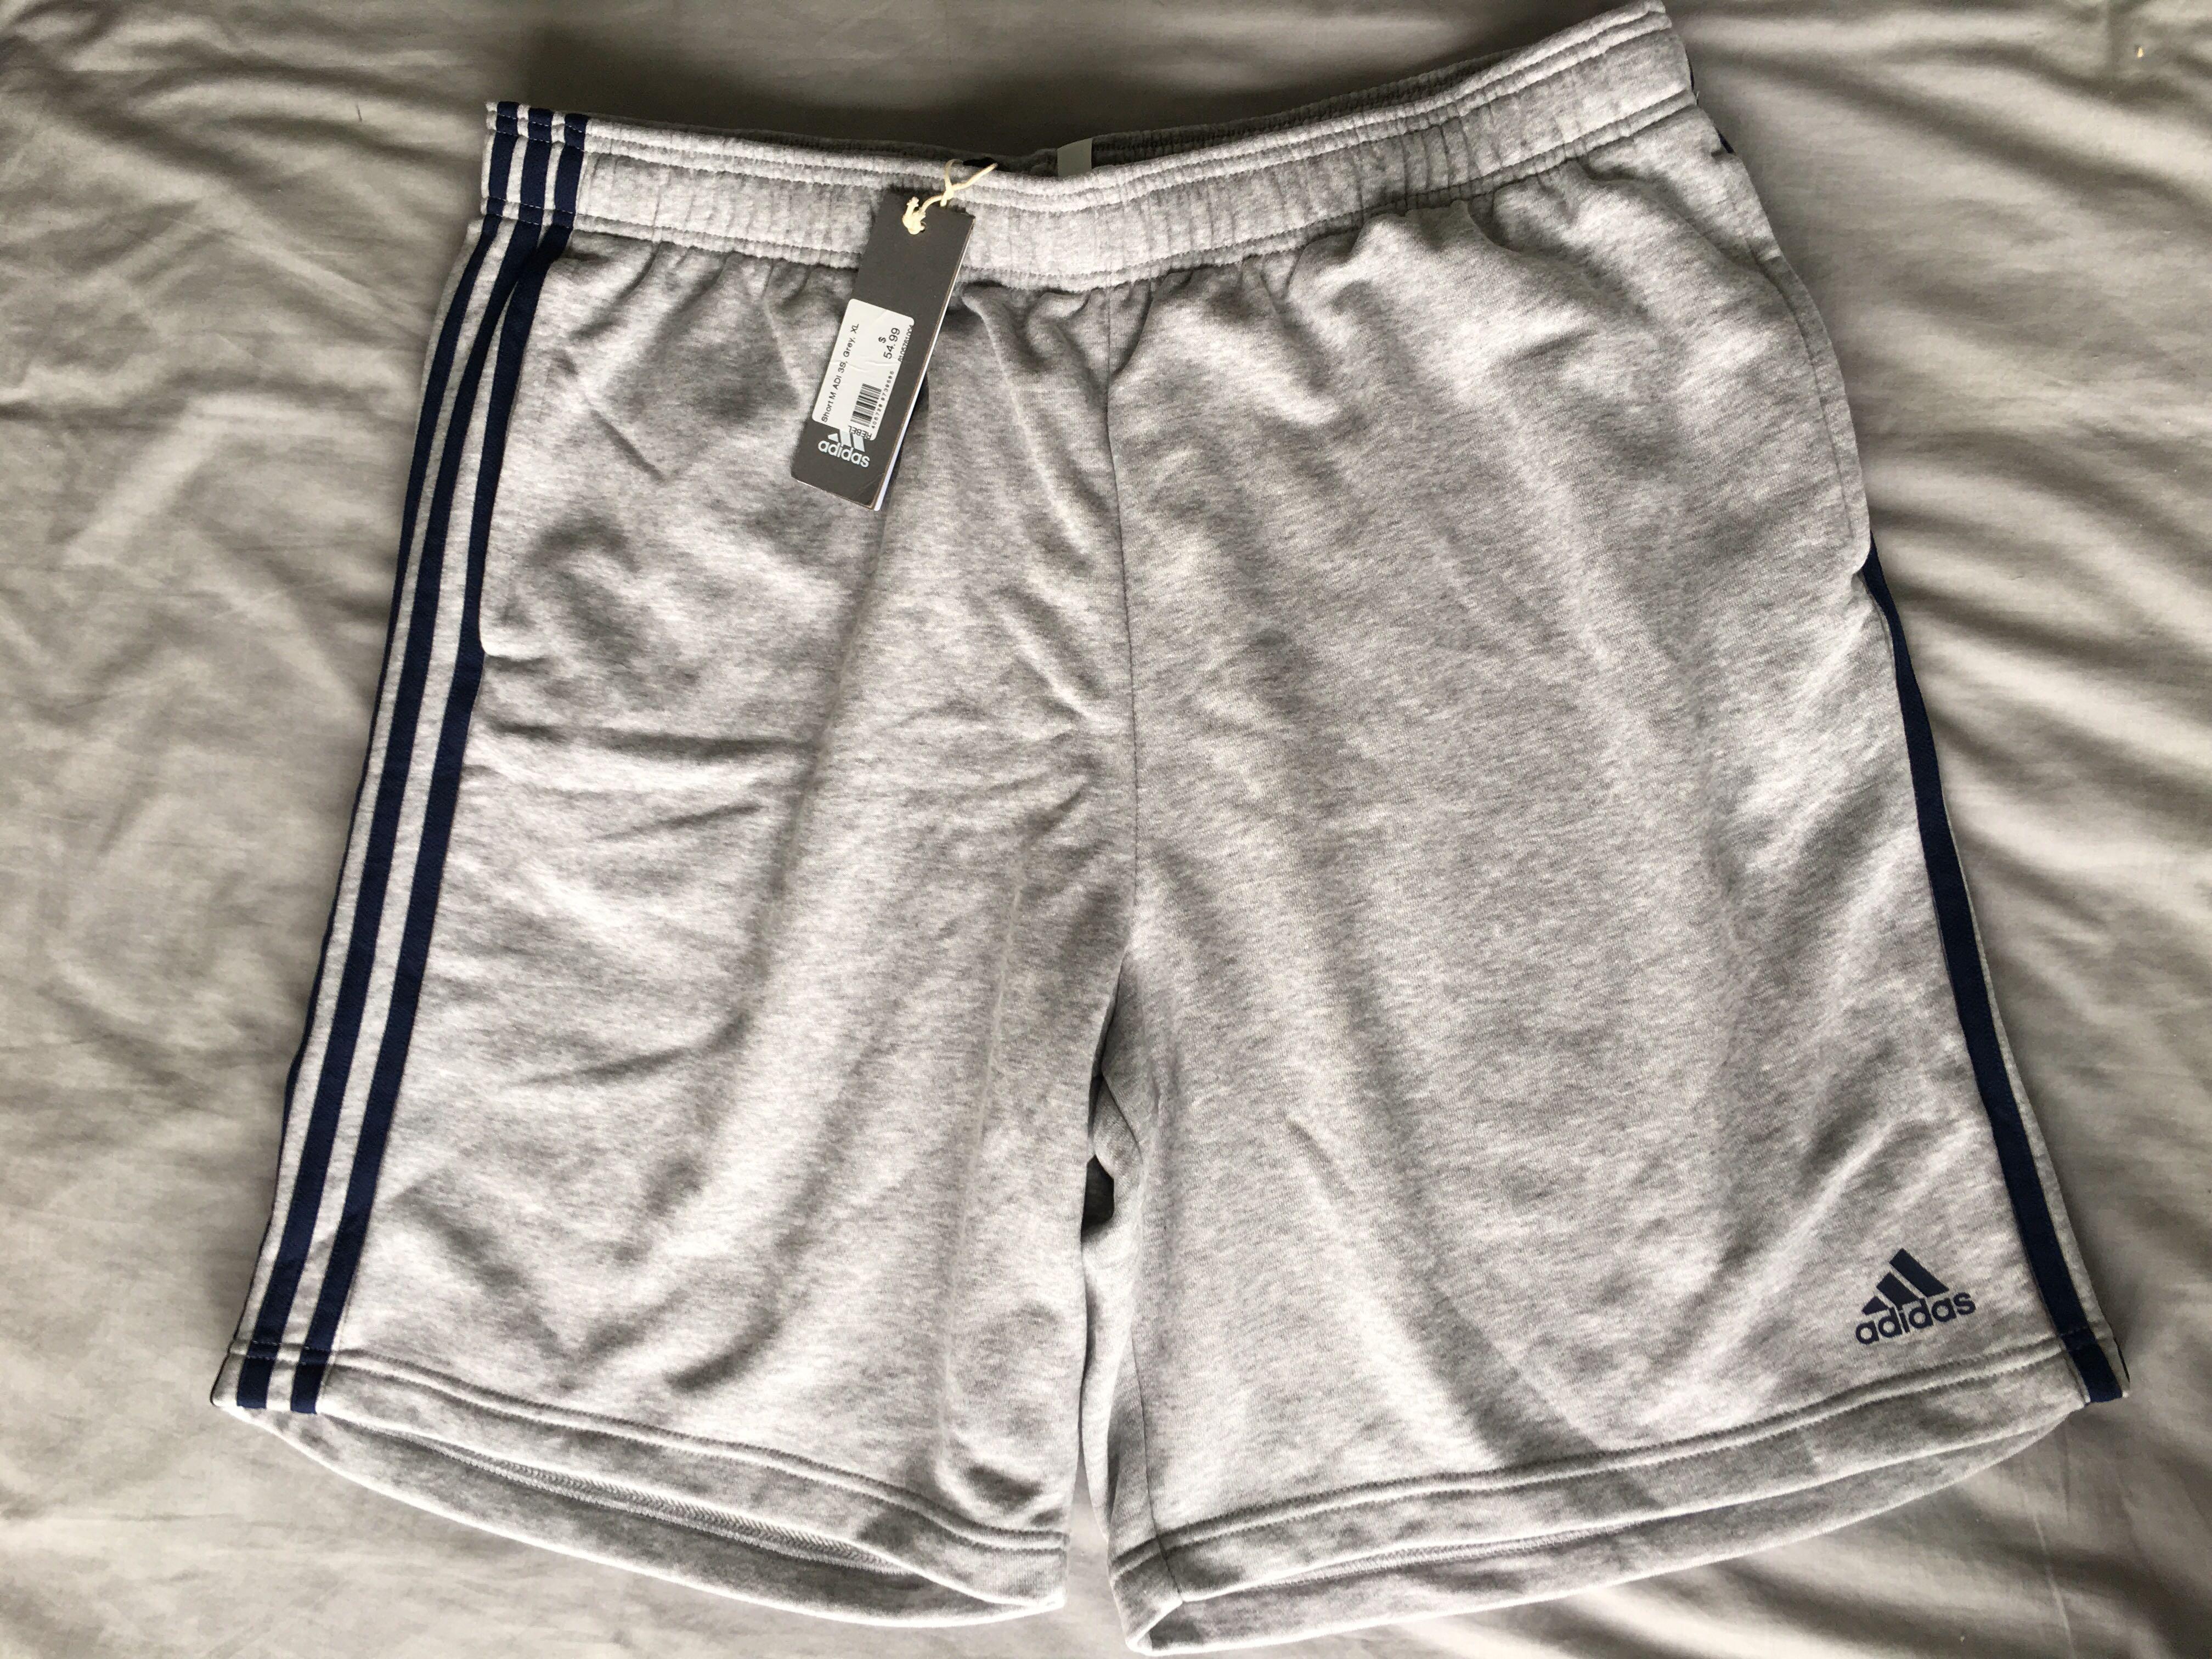 *BRAND NEW* Adidas 3 stripe short